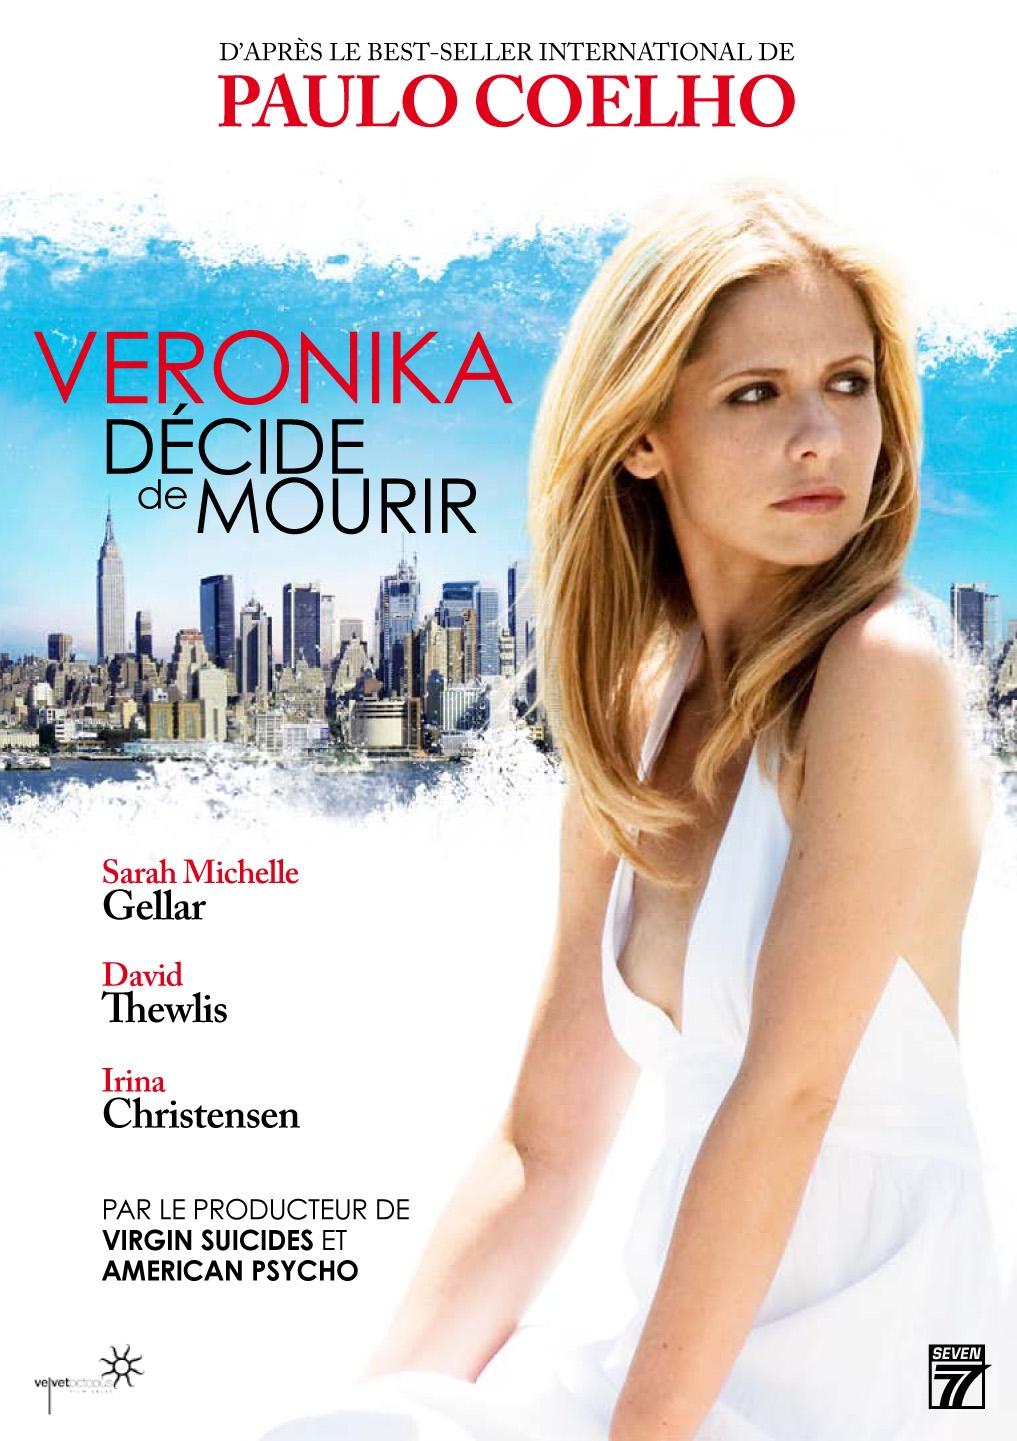 EXCLUSIF ! Véronika décide de mourir sortira en DVD en AVRIL 2010 !